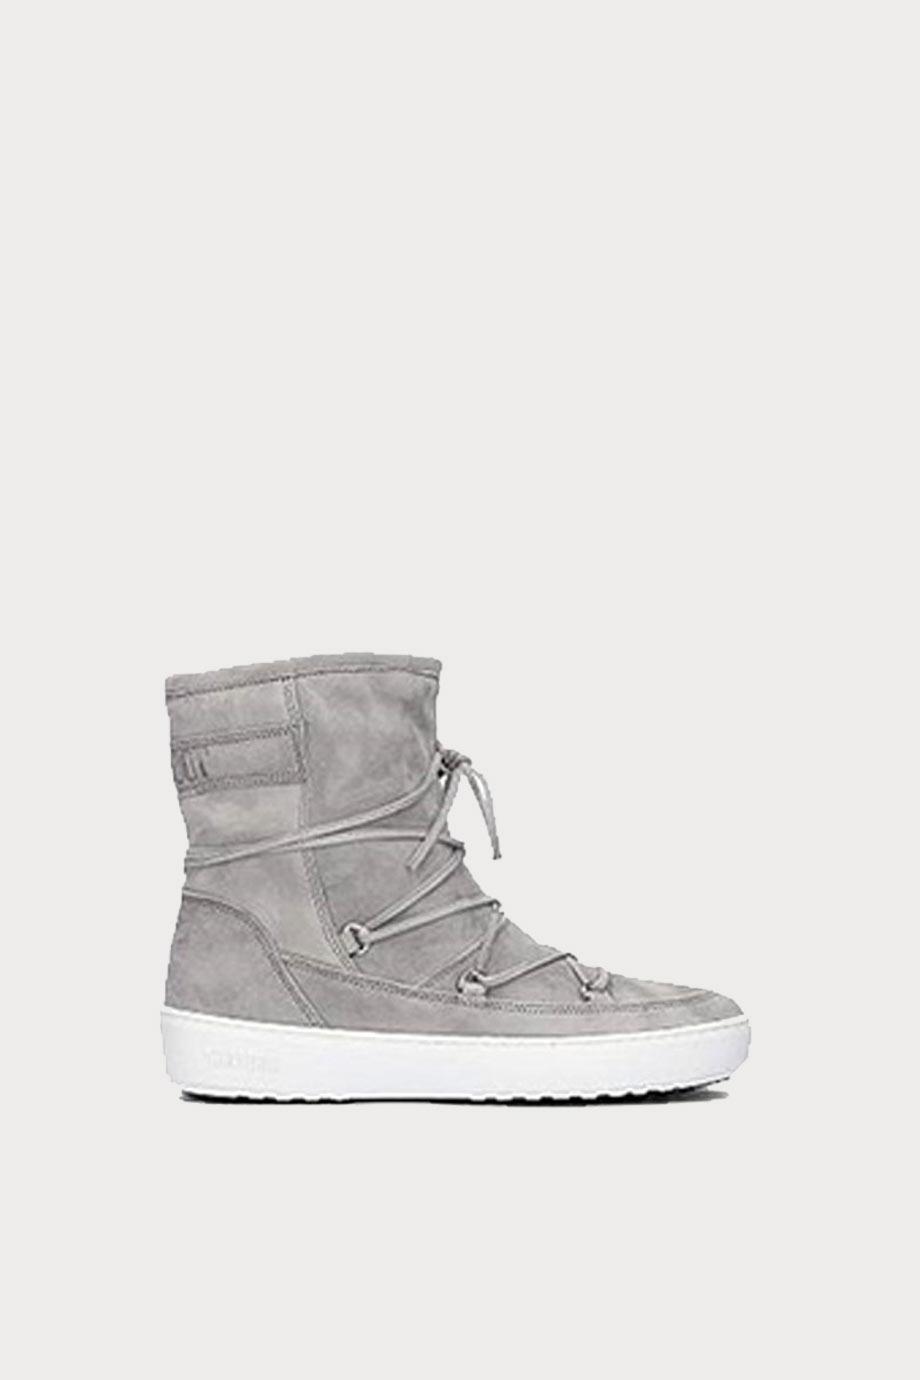 spiridoula metheniti shoes xalkida p 24101700 005 grey low laces MoonBoot